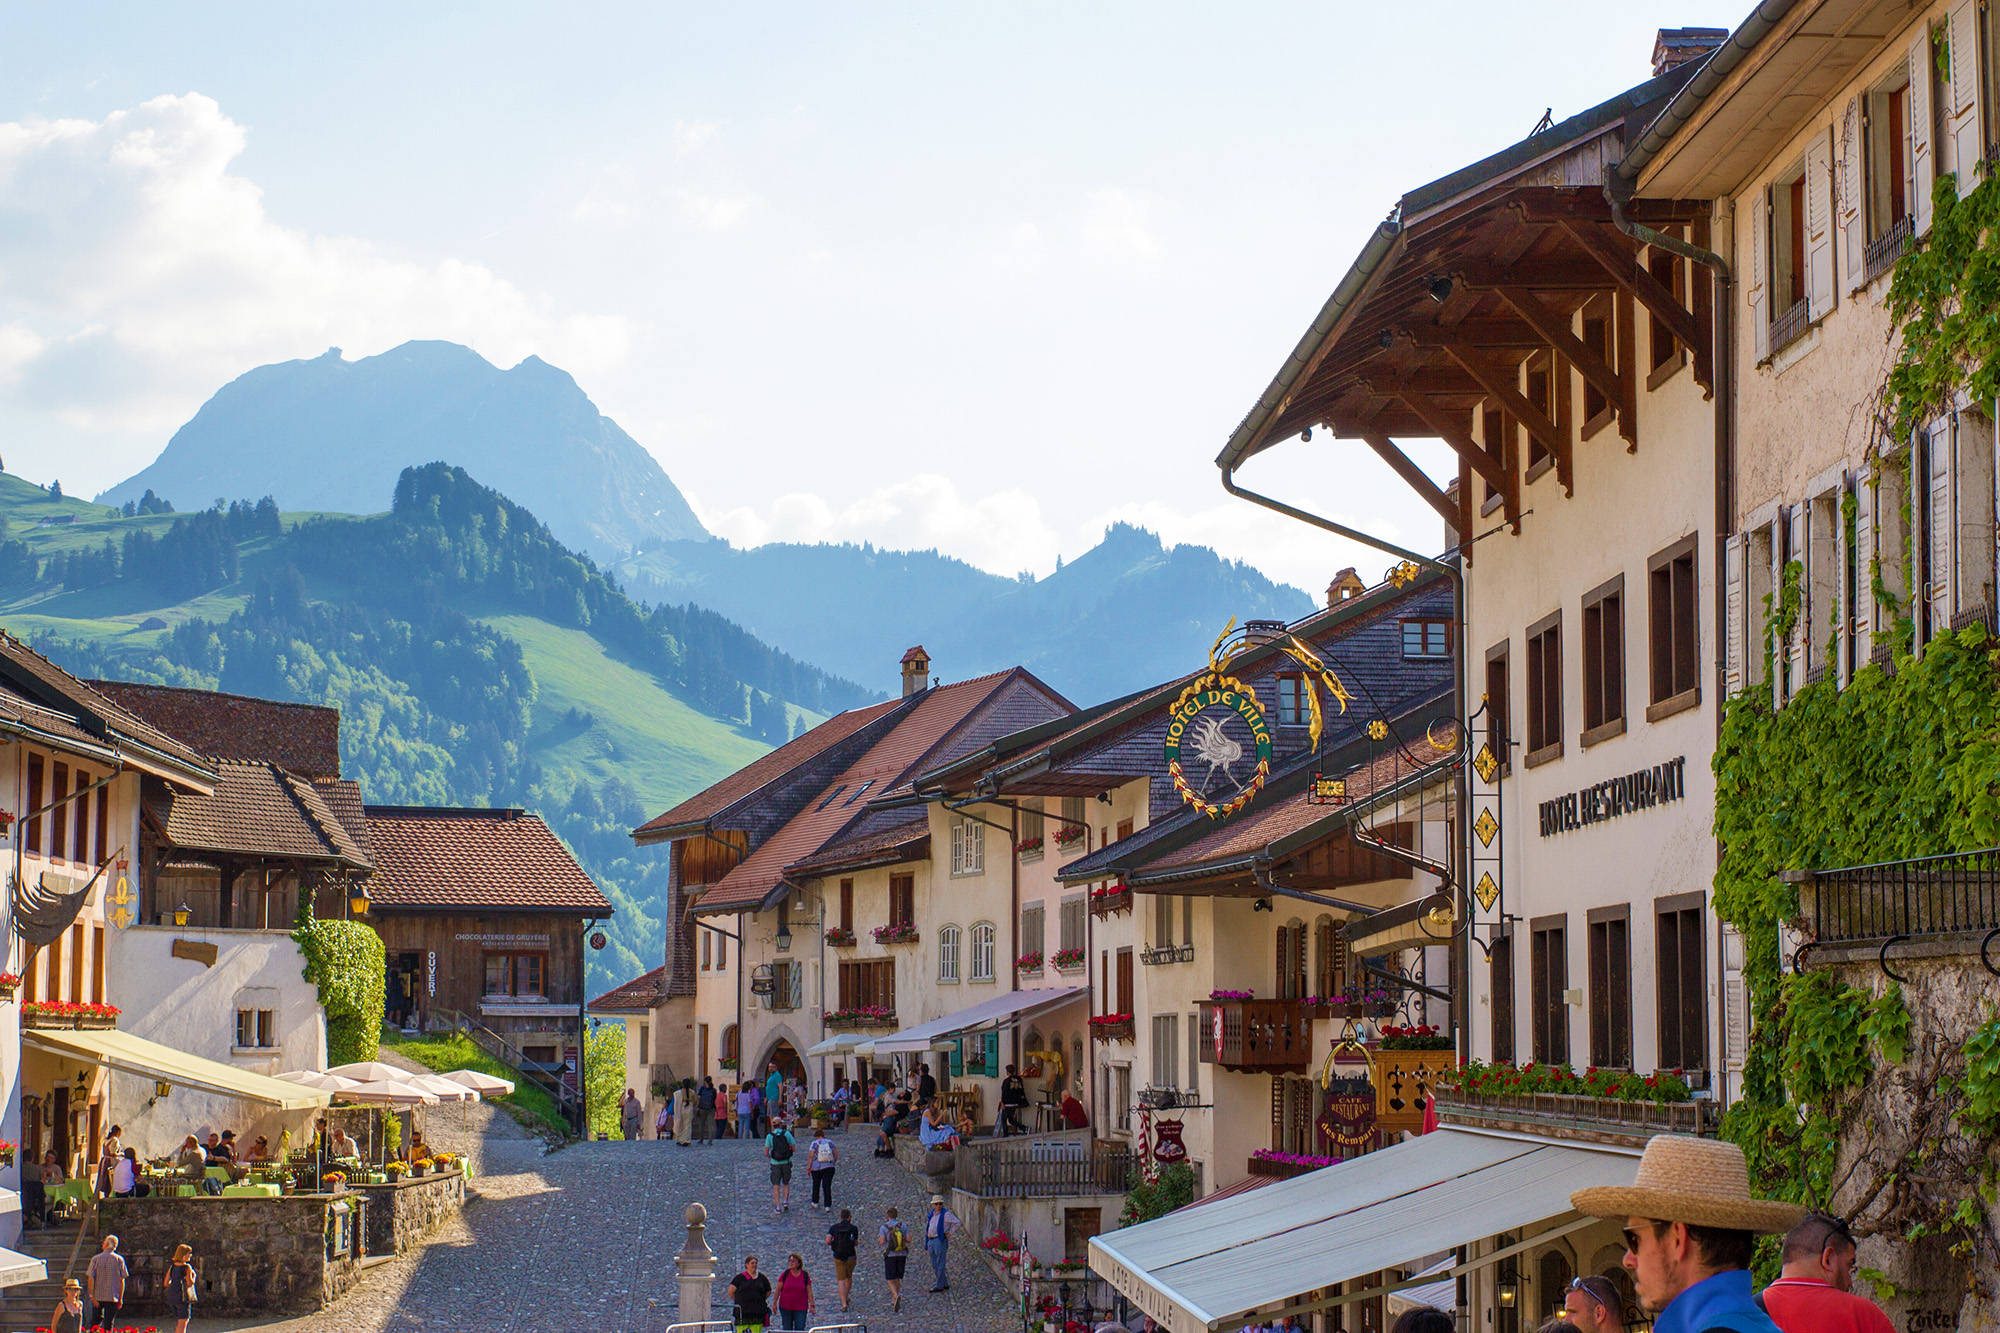 kt_2020_350_Keytours_excursions_Swisstours_gruyères_village11_2048_10